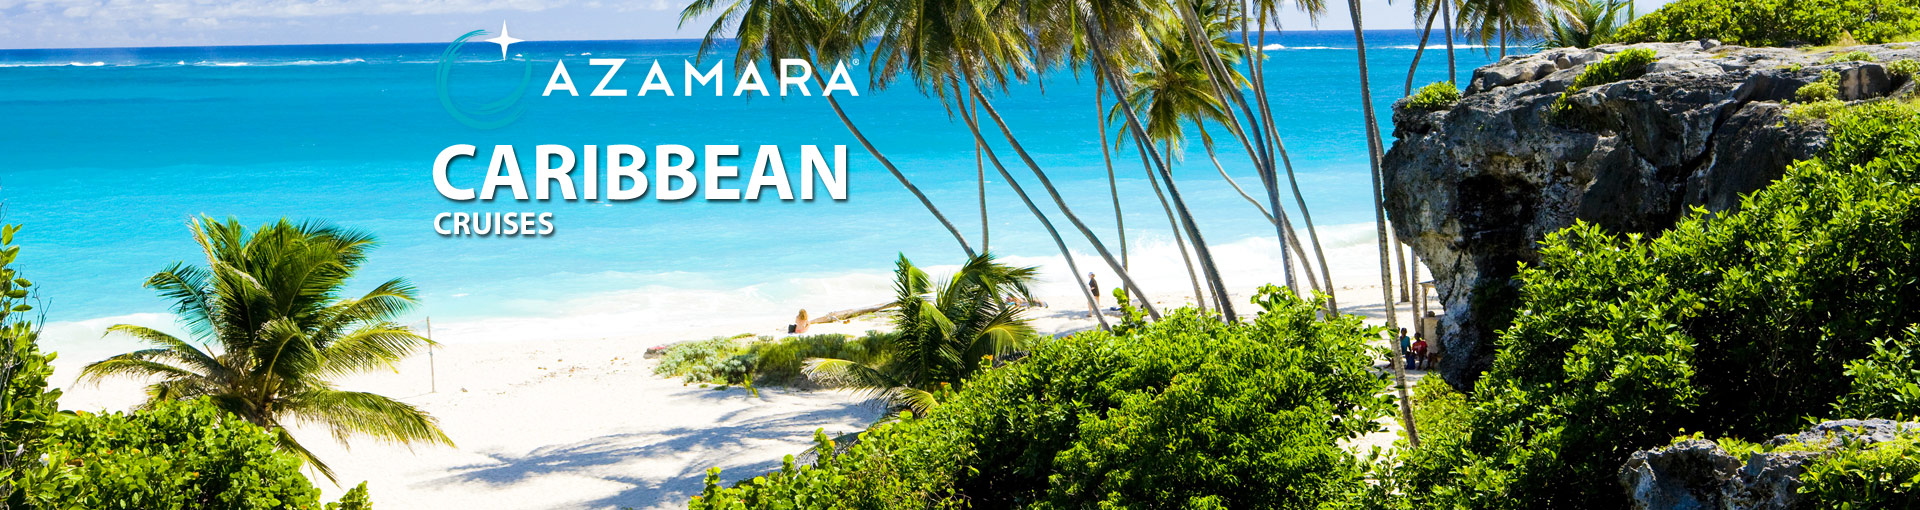 best caribbean cruise destinations 2017 2018 punchaos